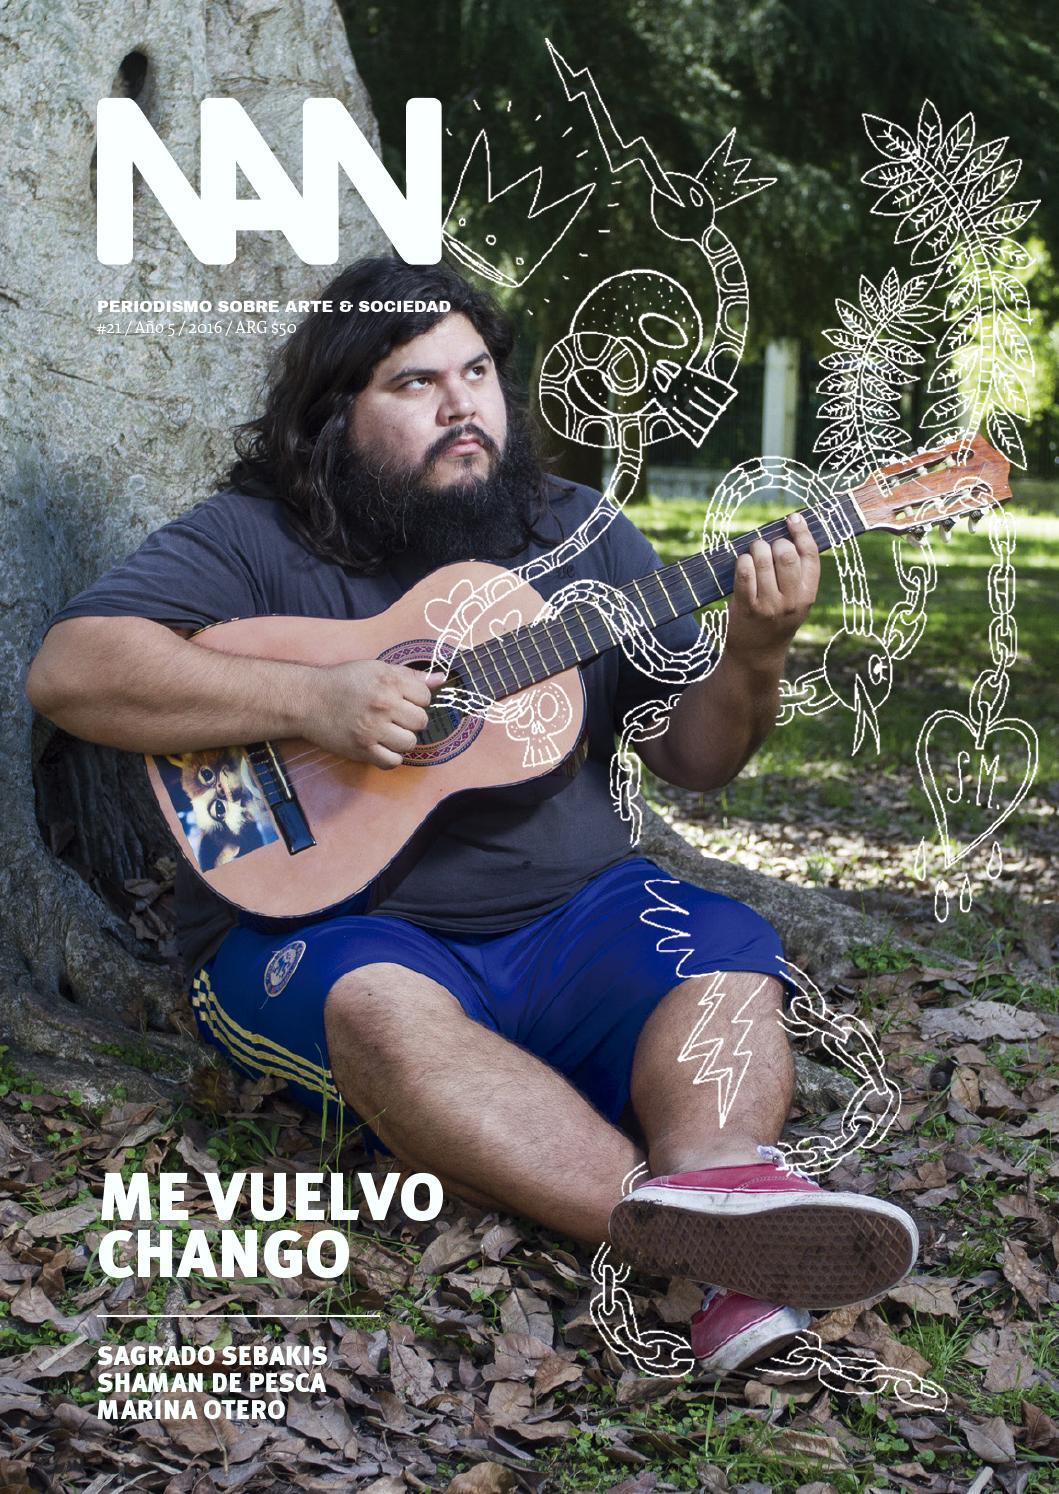 NAN #21 by Revista NAN - issuu